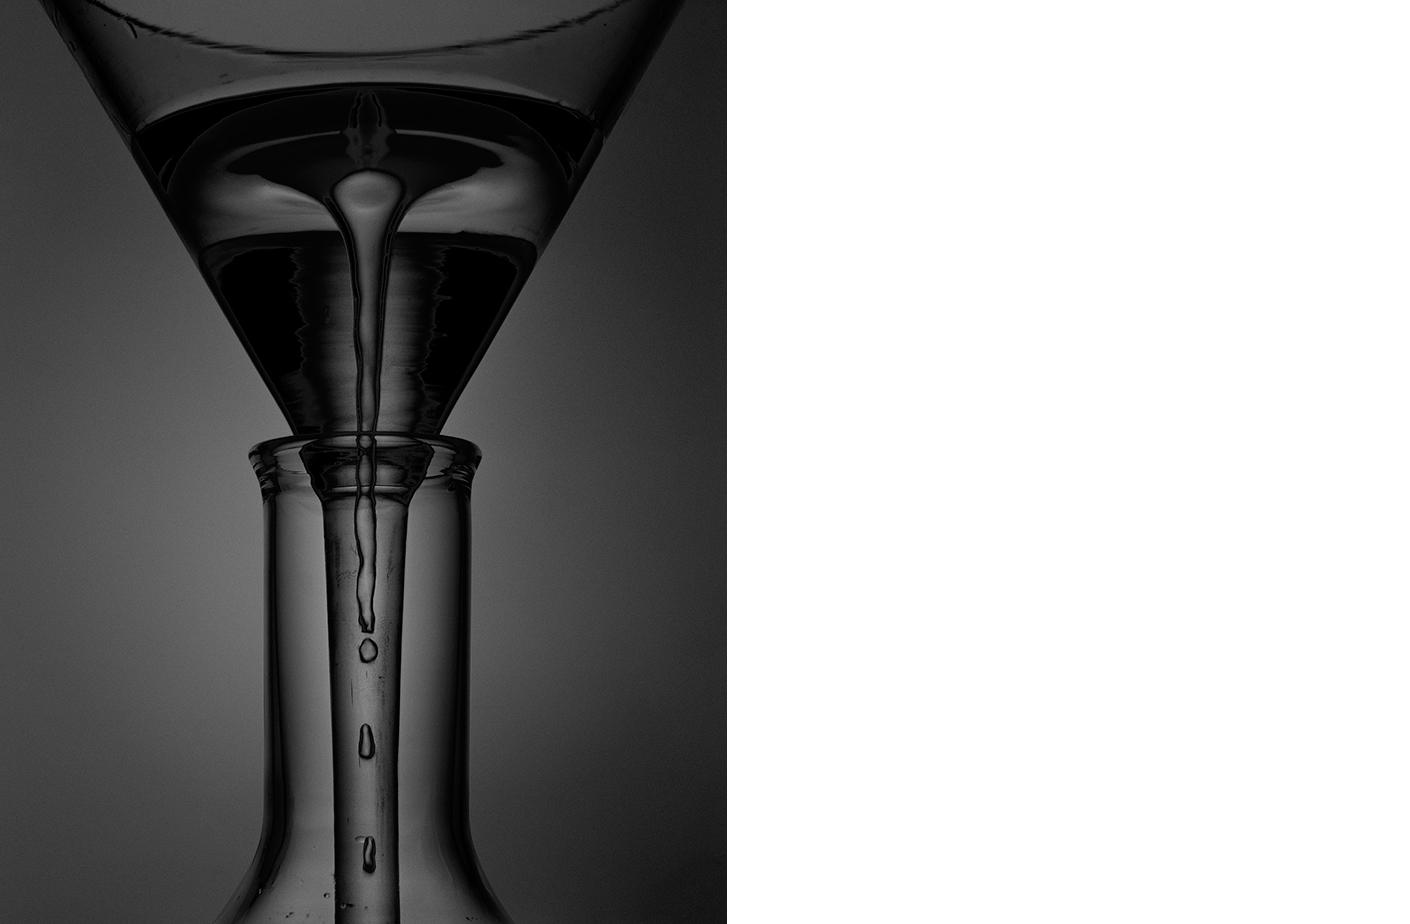 6452-04 Physics - Funnel  Platinum Palladium Print 13.06 x10.31 inch Image Size 16.88 x 22.13 inch Paper Size 1 BAT / 1 PP /2 AP / 24 EDP